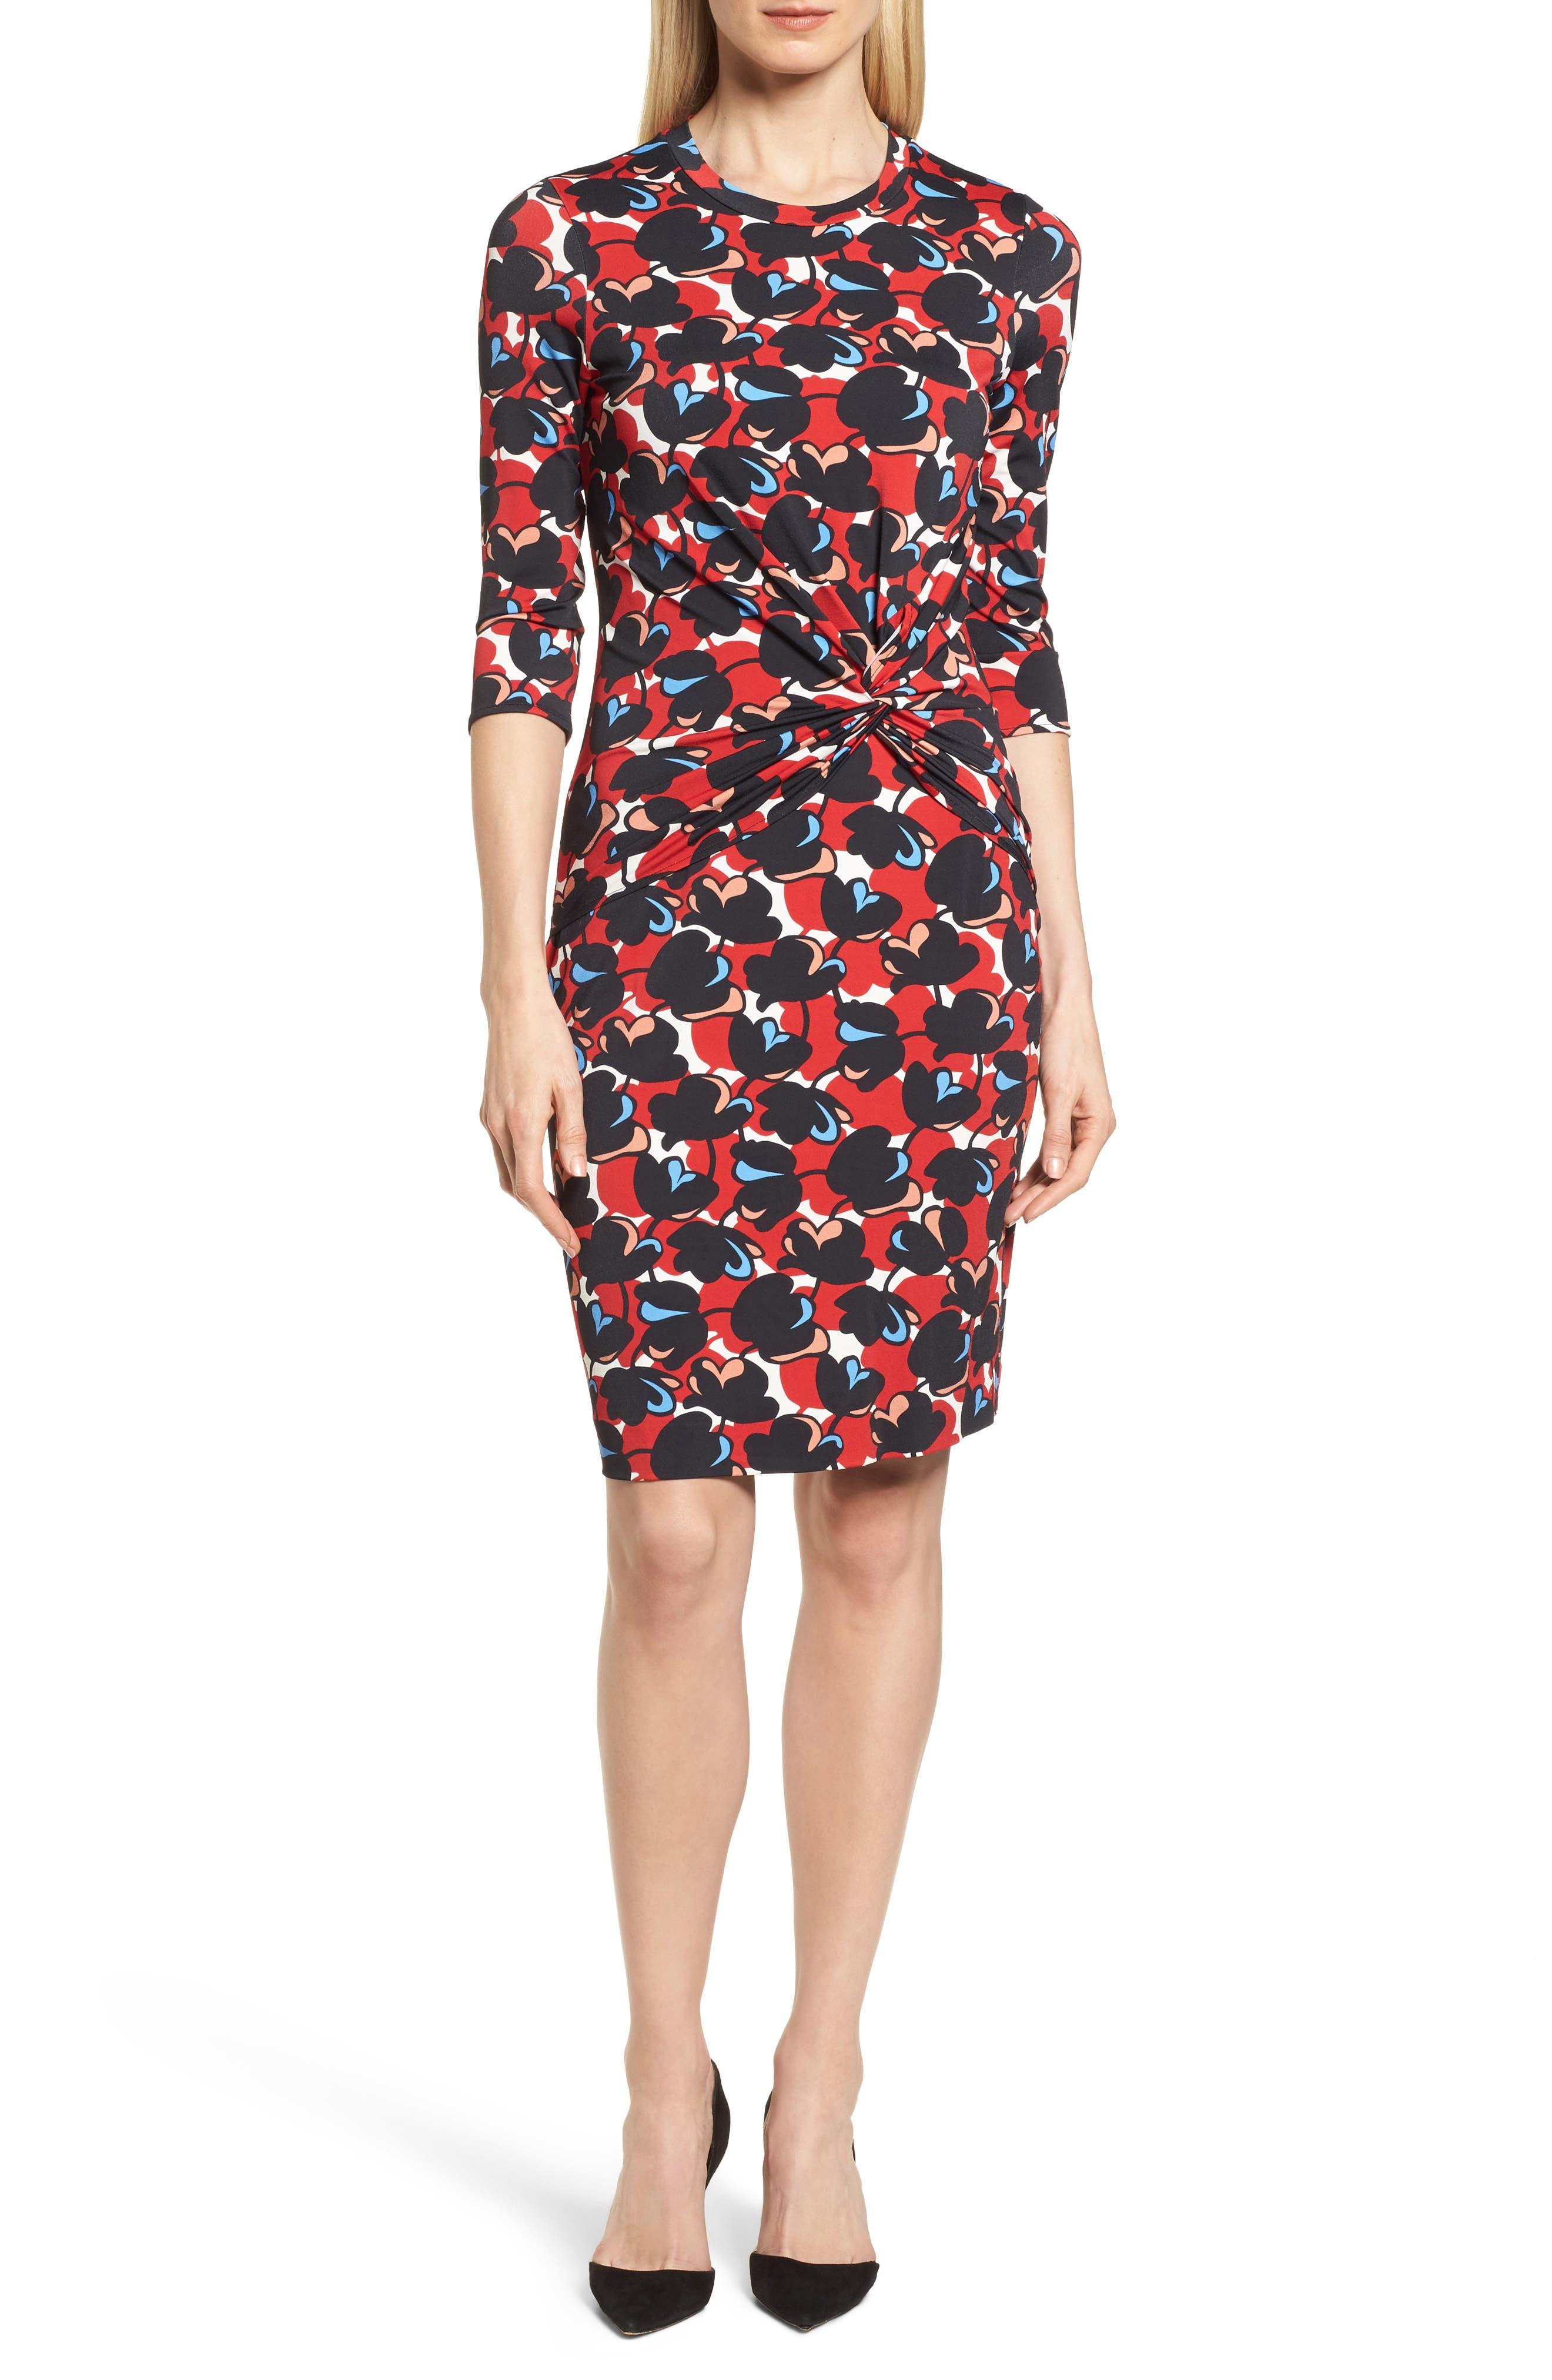 Eleika Print Jersey Sheath Dress,                             Main thumbnail 1, color,                             Multicolor Flower Print